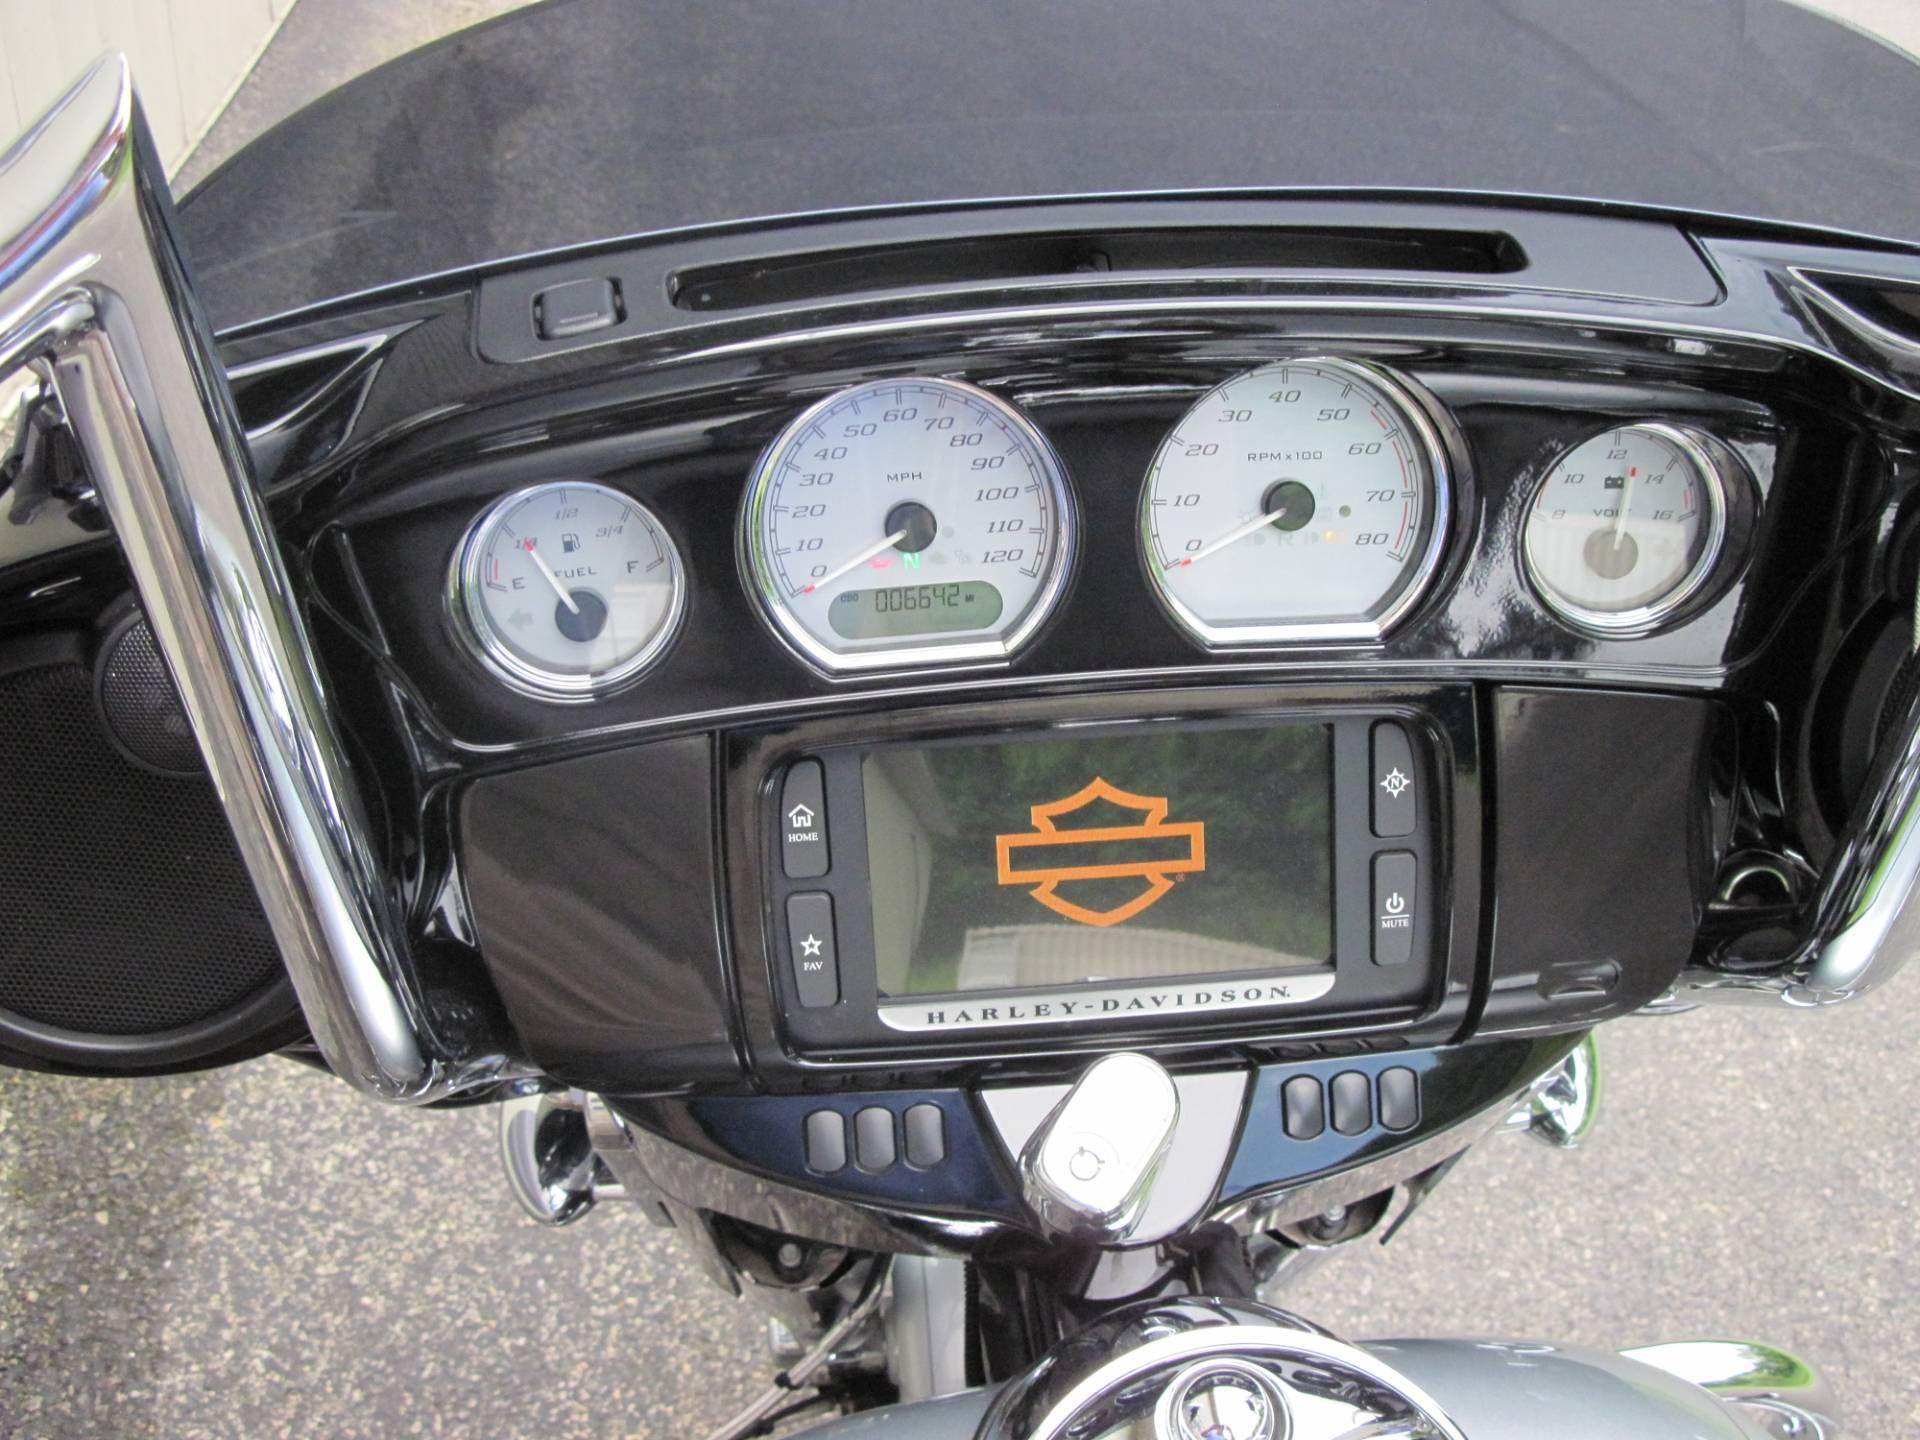 2015 Harley-Davidson Street Glide® Special in Guilderland, New York